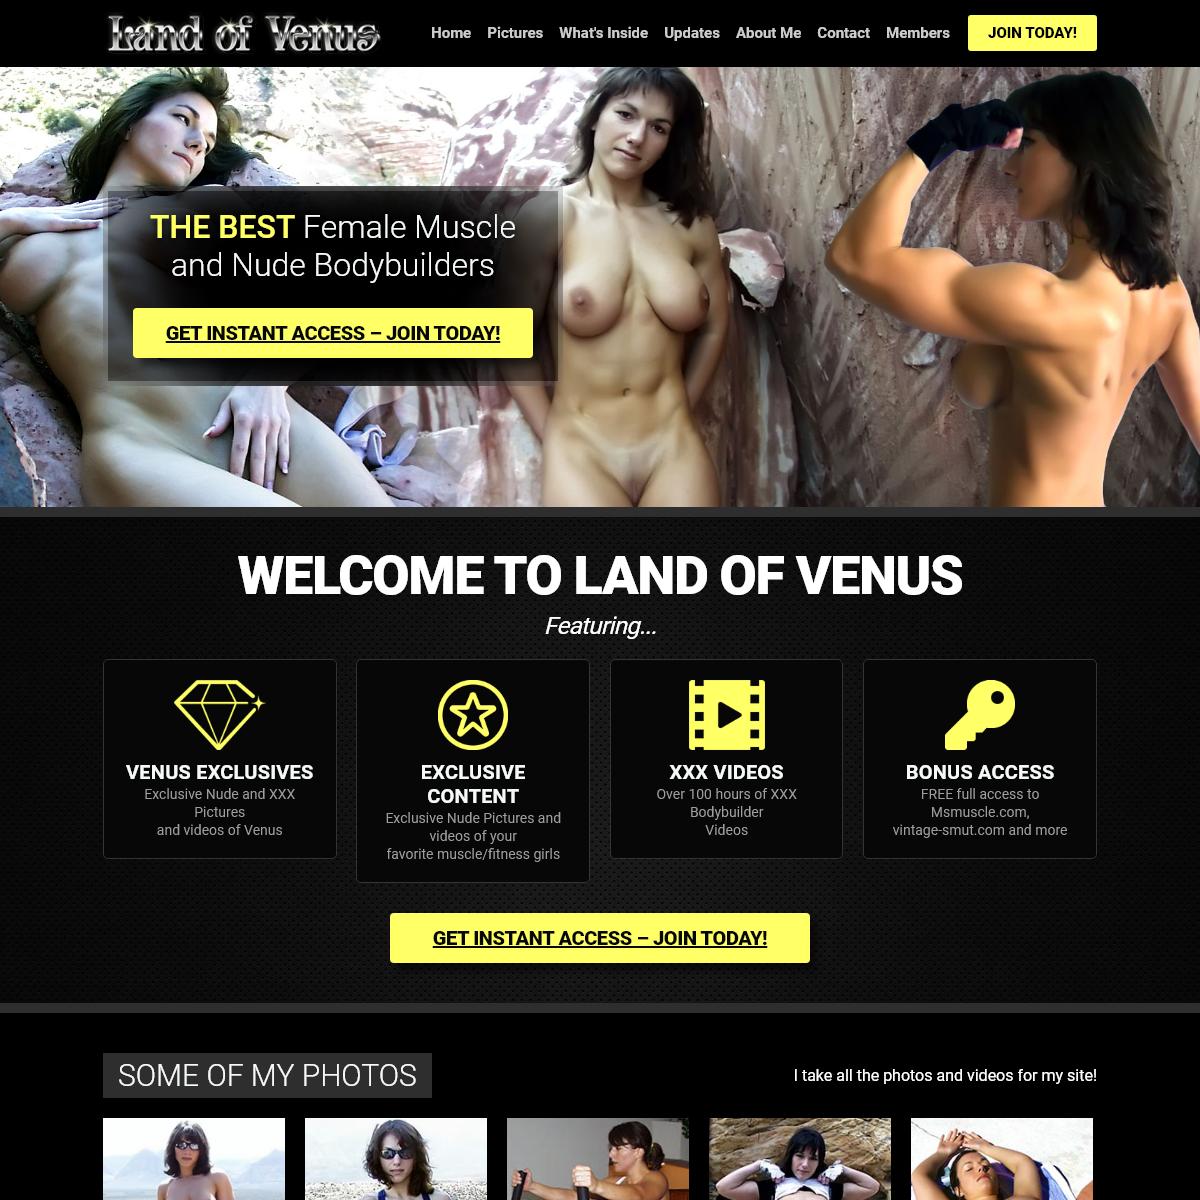 A complete backup of www.www.landofvenus.com